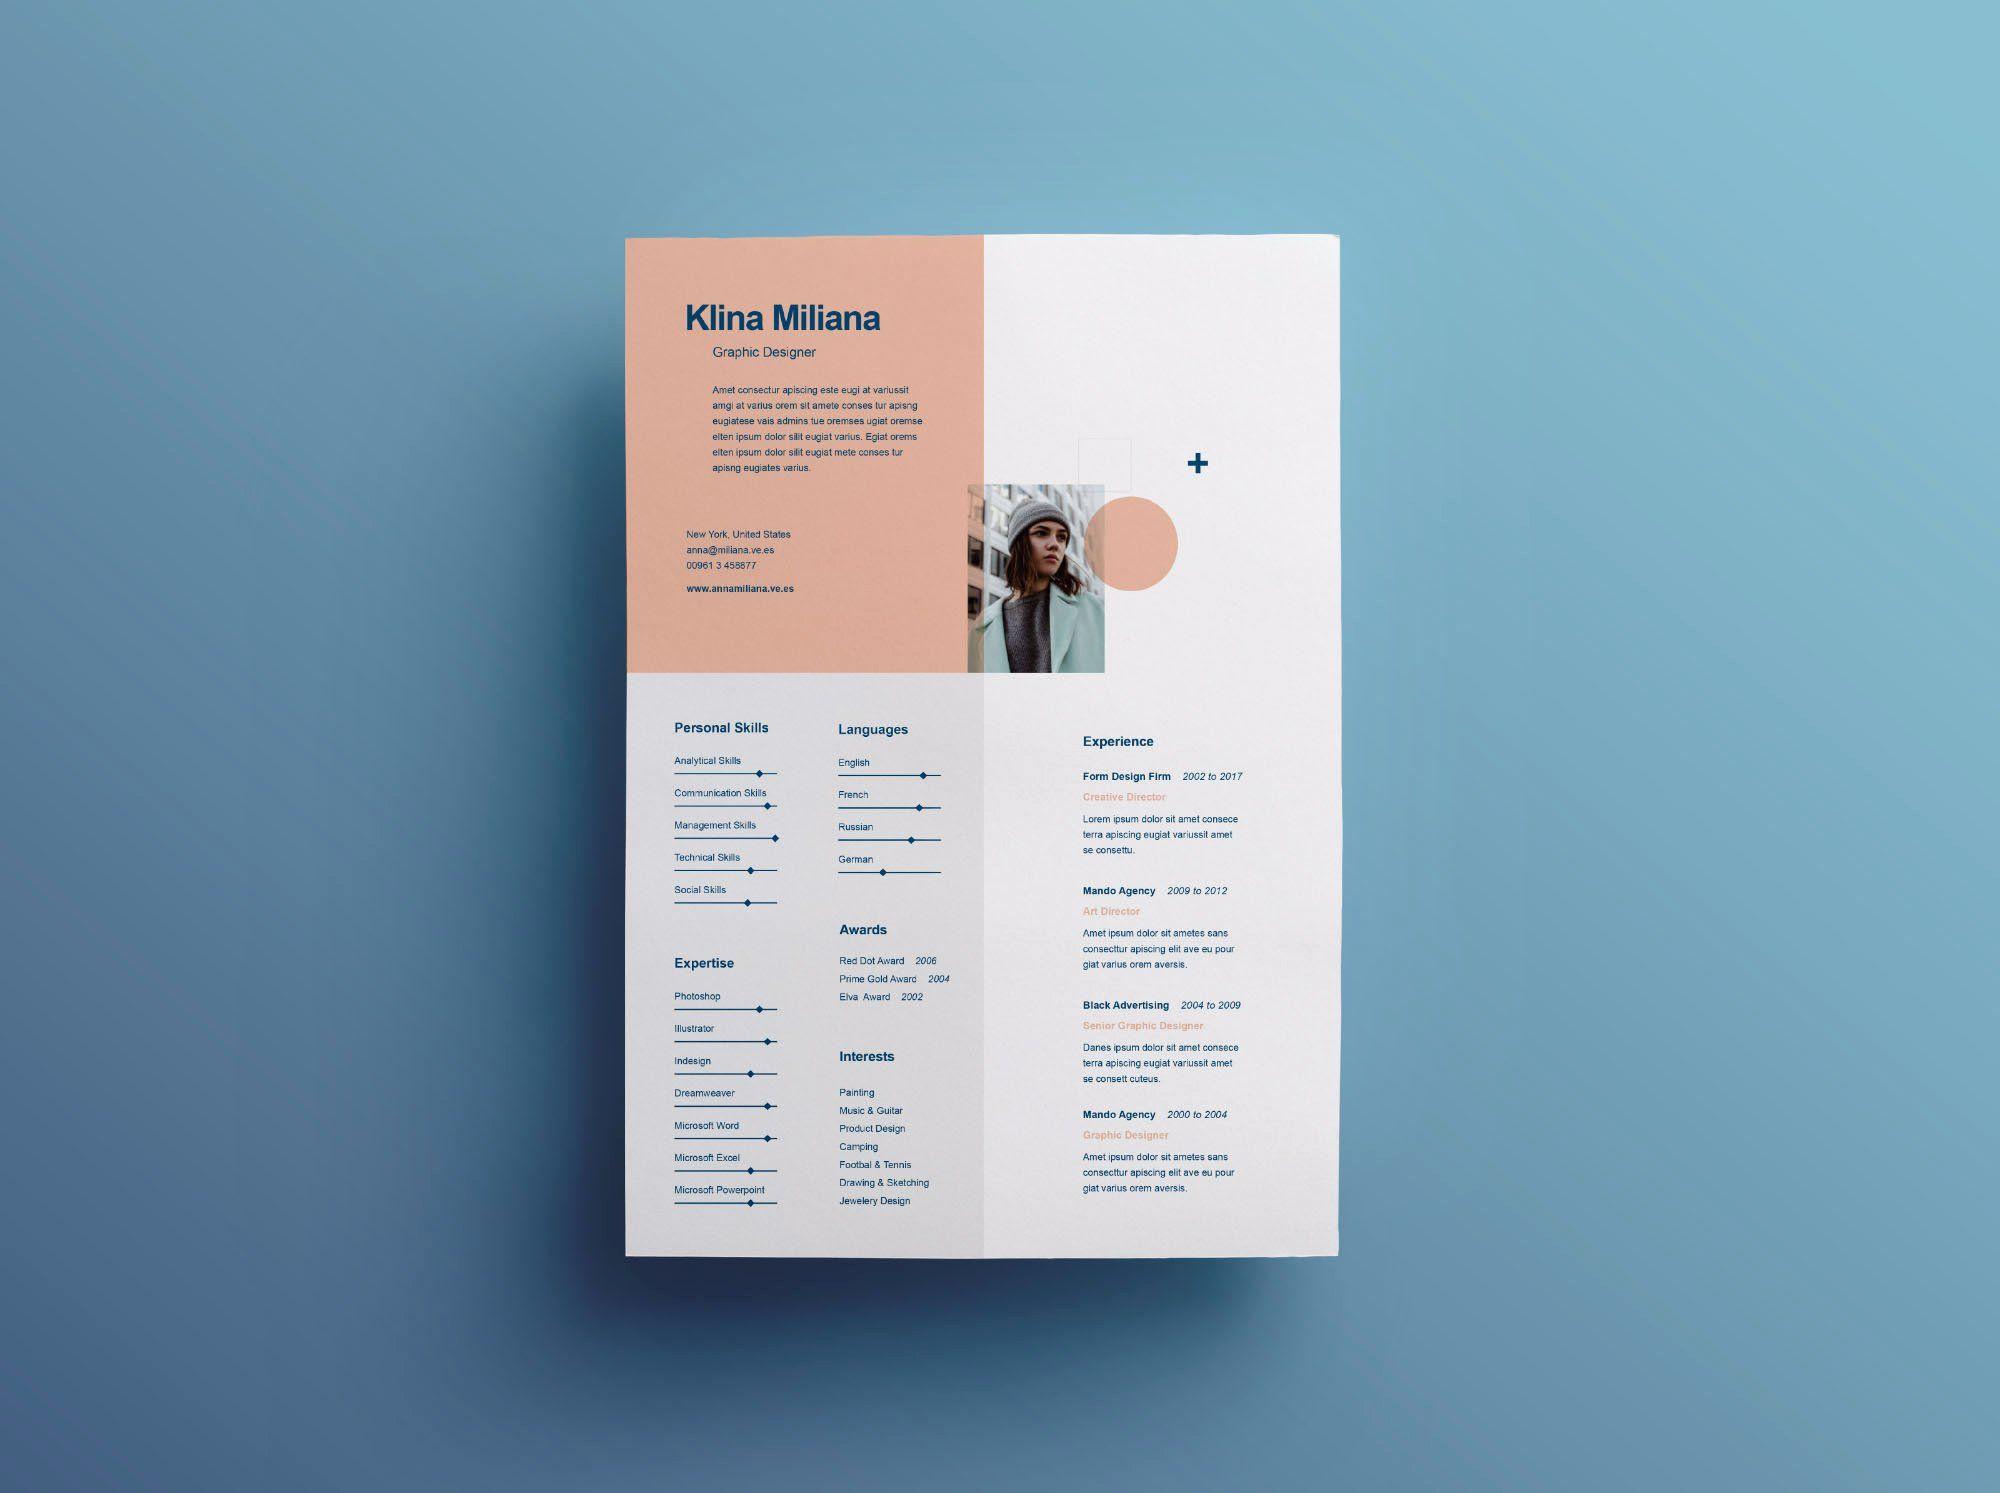 Graphic Designer Resume Pdf New Graphic Design Resume Templates Free Download Template Microsoft In 2020 Graphic Design Resume Resume Design Creative Resume Templates,Interior Design Process Steps